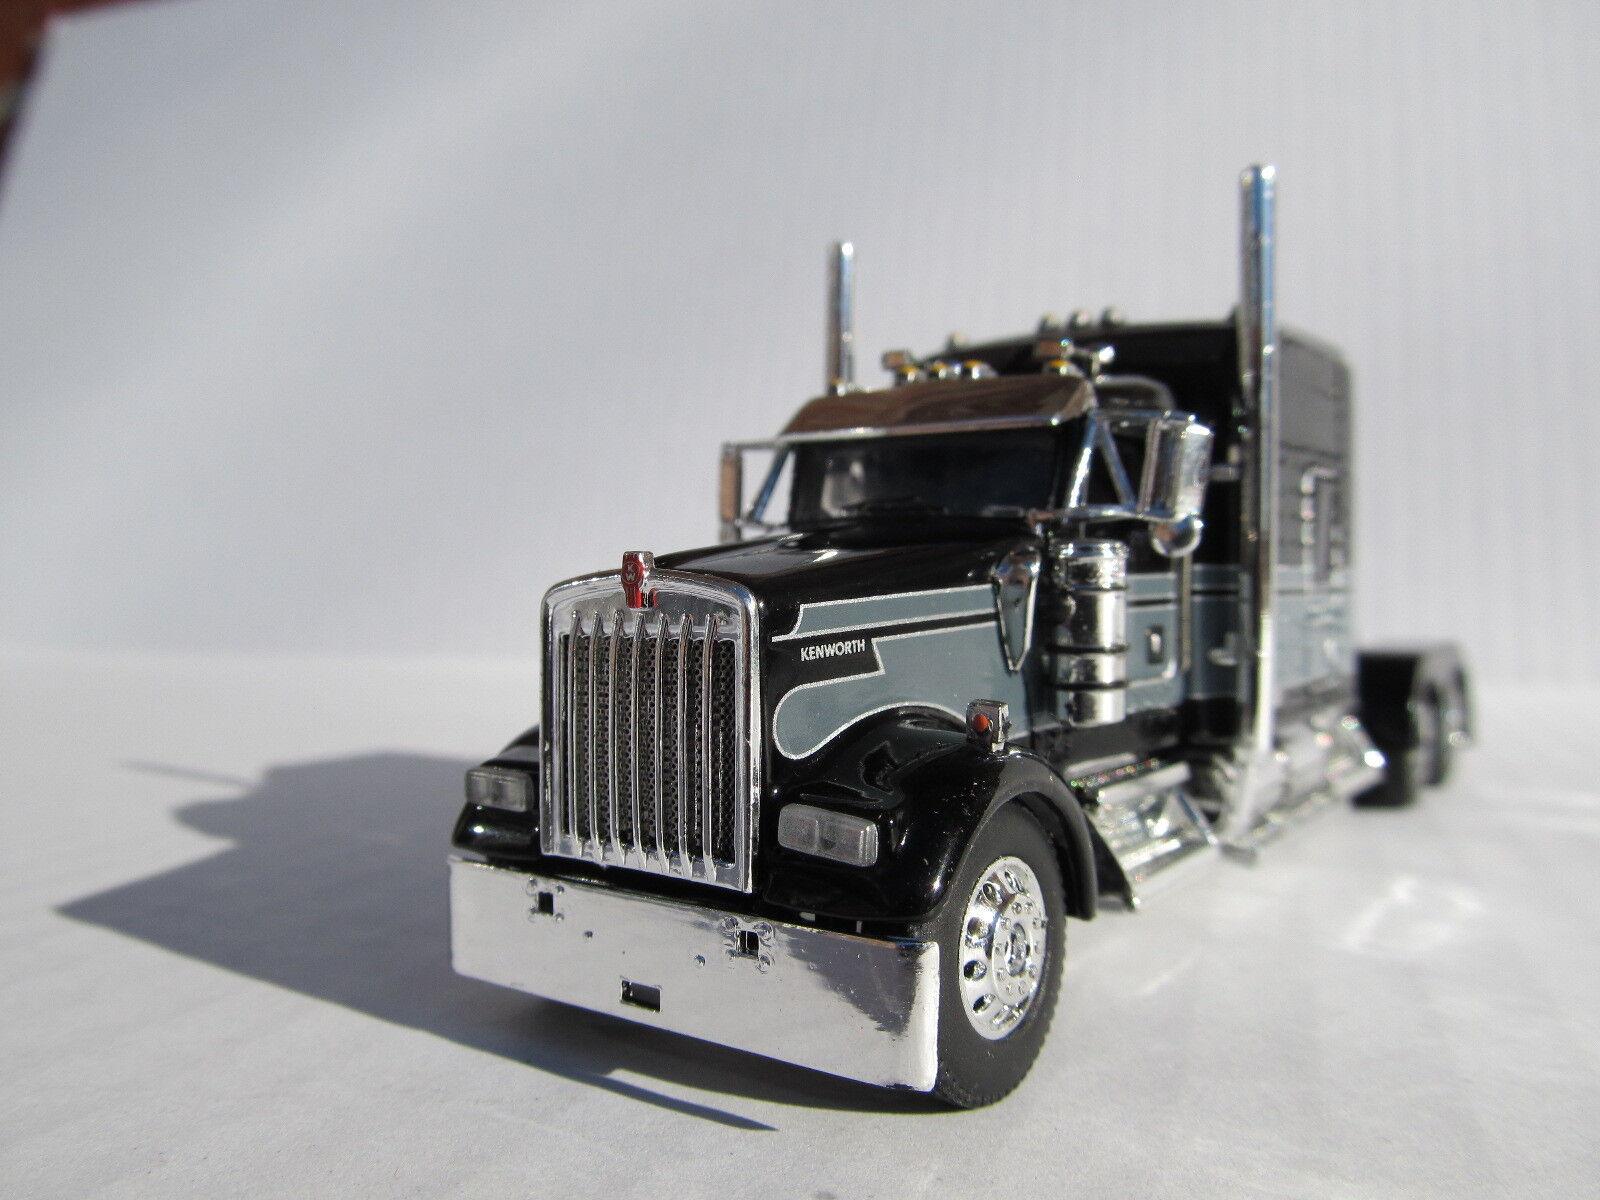 Dcp Escala 1 64 W-900 Kenworth Studio Sleeper nero Con grigio Seminole Stripe